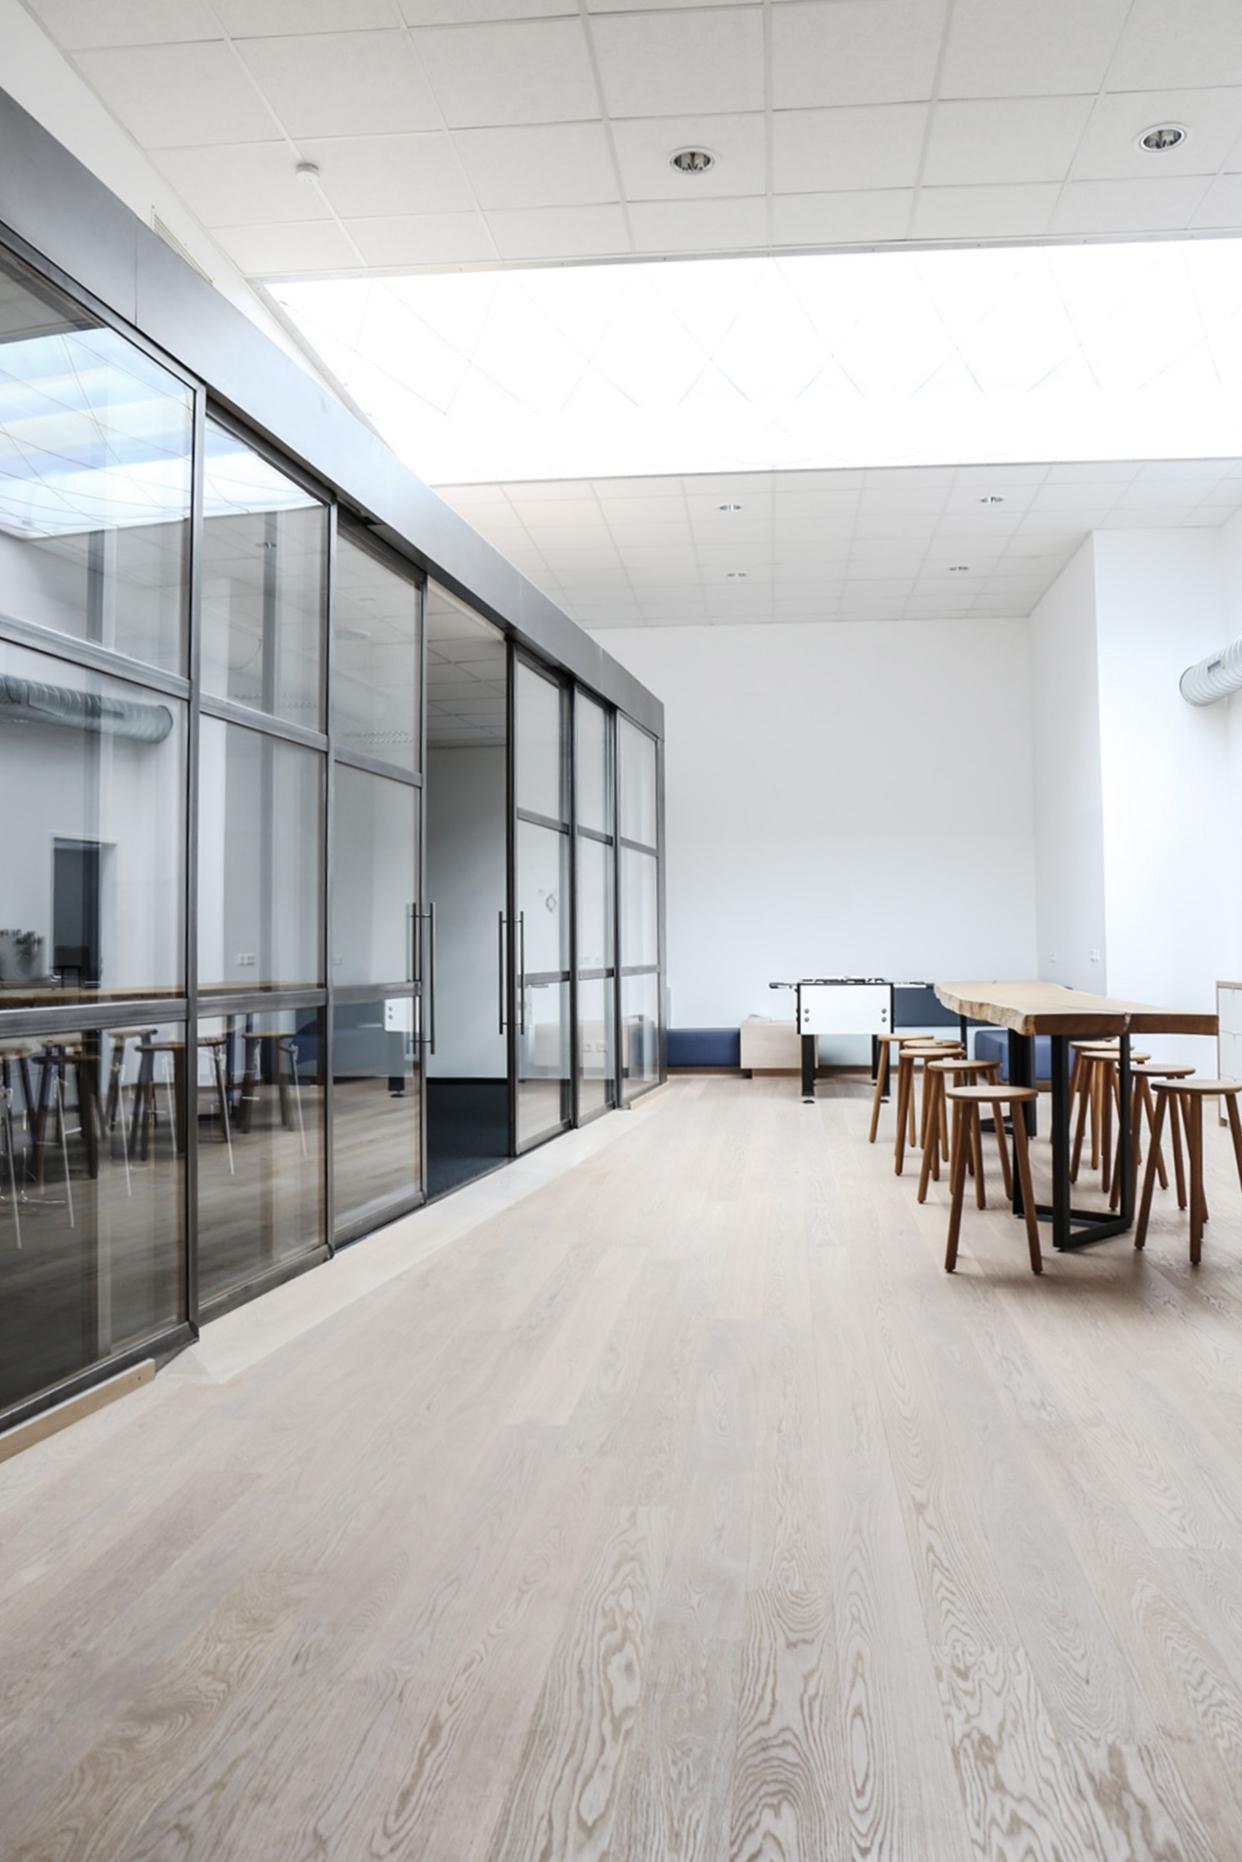 011-interior-design-office-view-point-wessling-buero-philipp-moeller.jpg